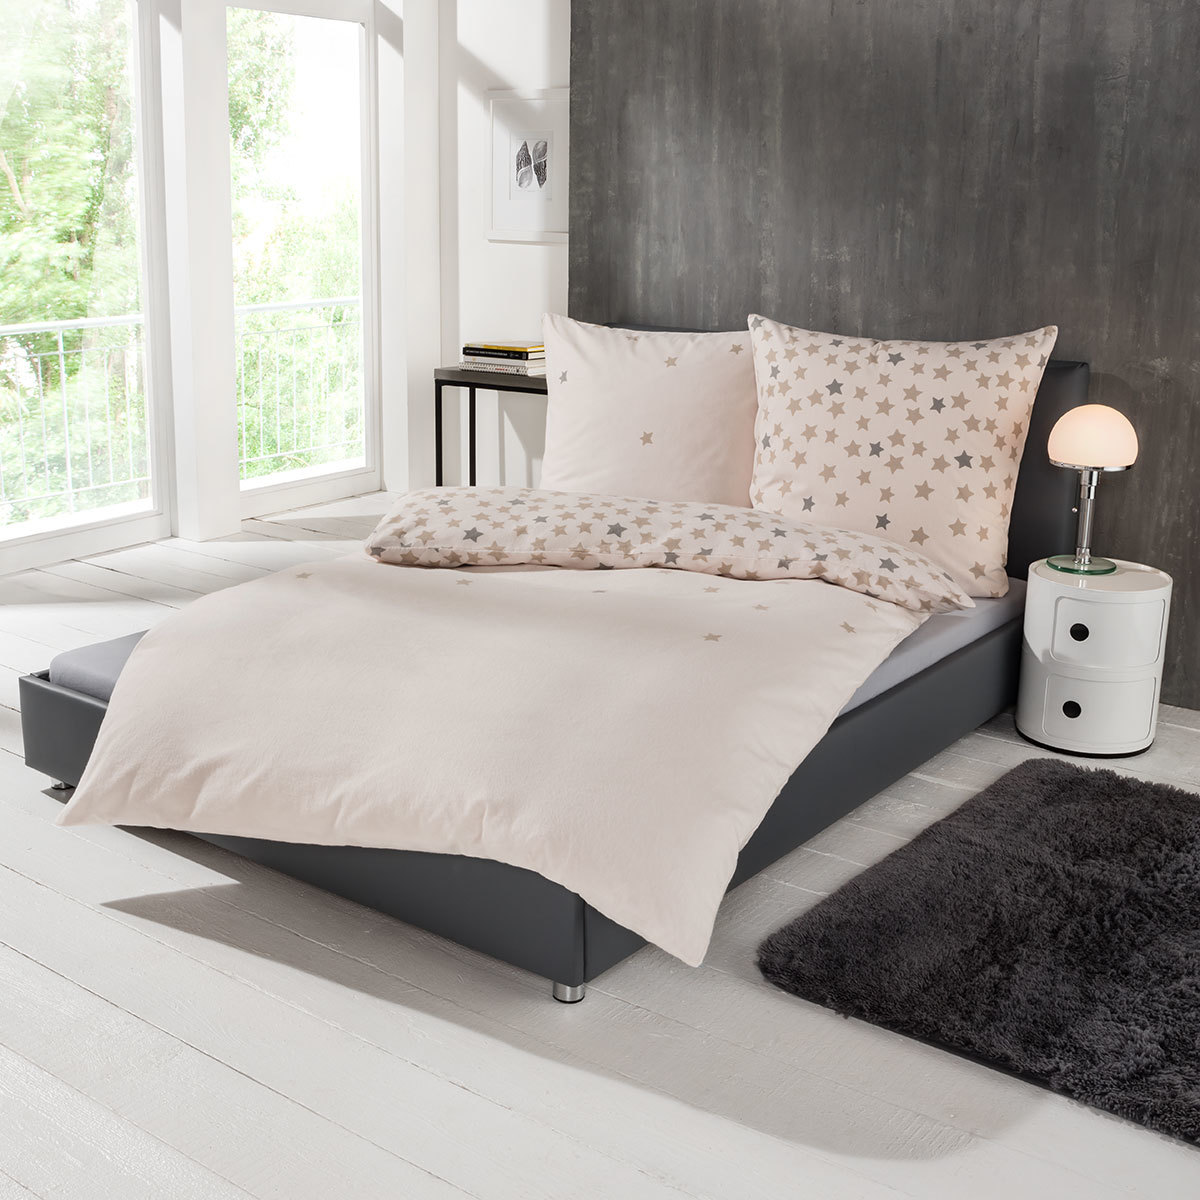 bettw sche flanell my blog. Black Bedroom Furniture Sets. Home Design Ideas